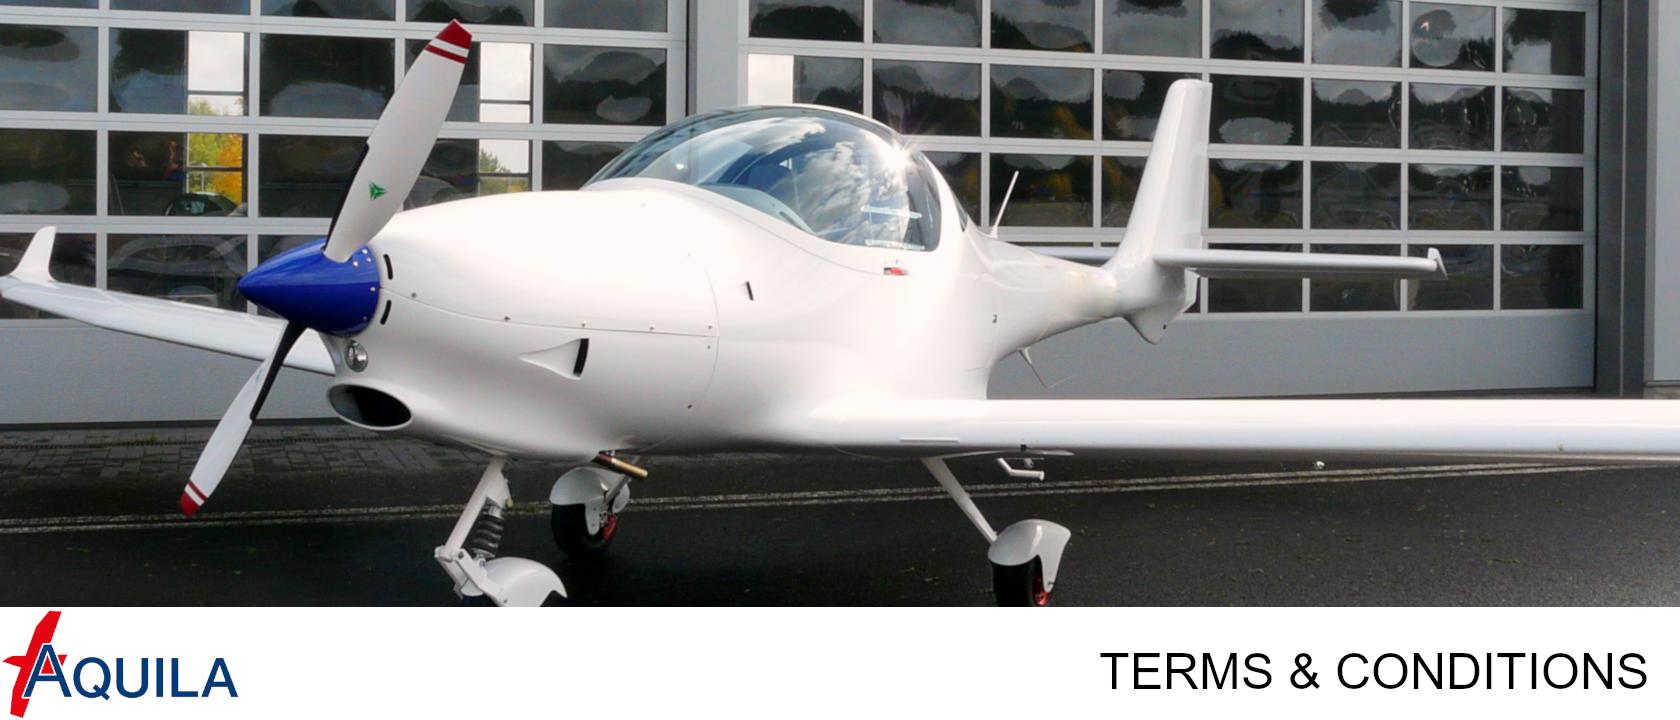 TERMS & CONDITIONS – AQUILA Aviation International GmbH